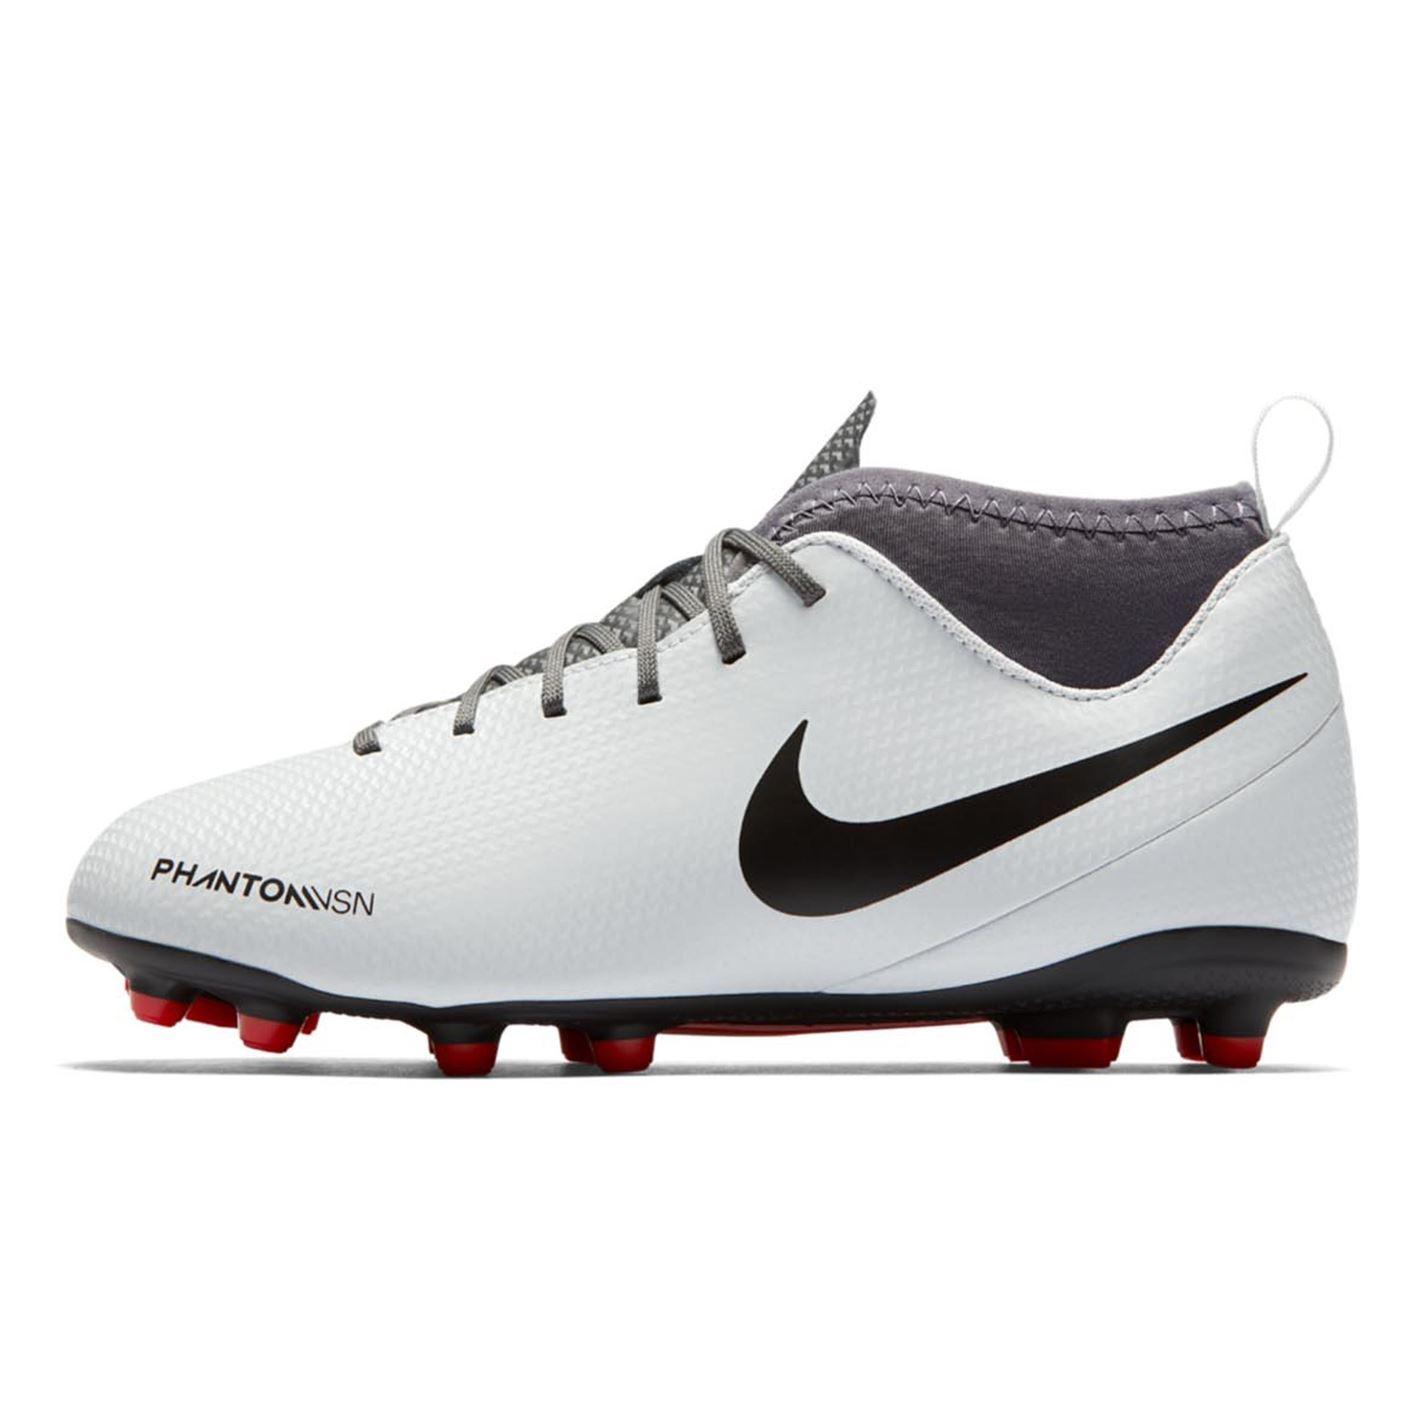 miniature 12 - Nike-Phantom-Vision-Club-DF-FG-Firm-Ground-Chaussures-De-Football-Juniors-Football-Crampons